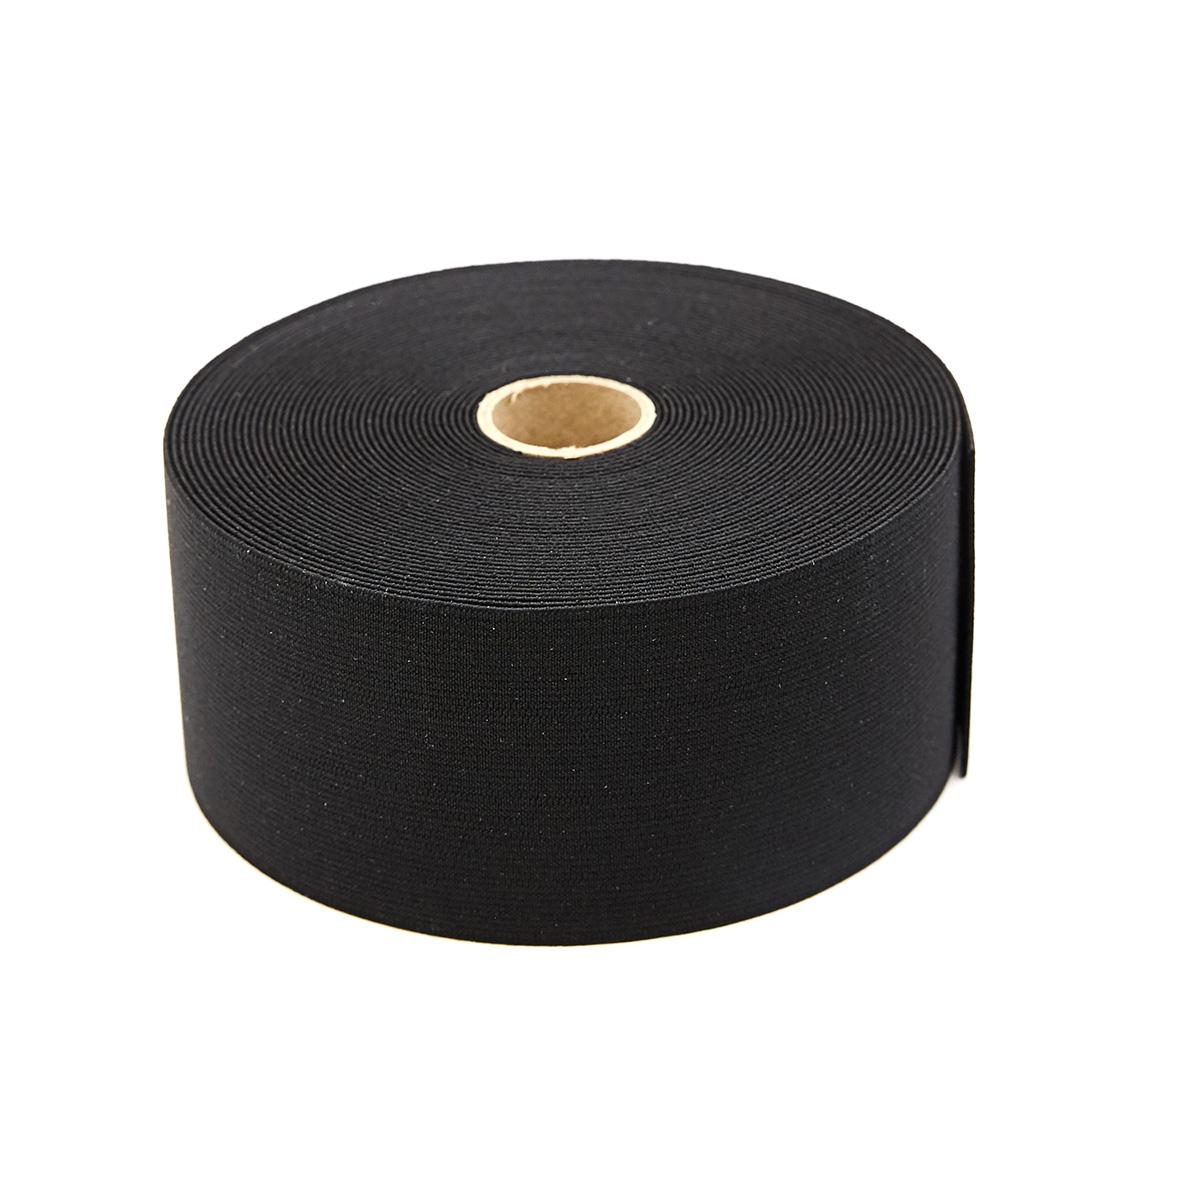 955617 Эластичная лента-пояс 60 мм черный цв. Prym